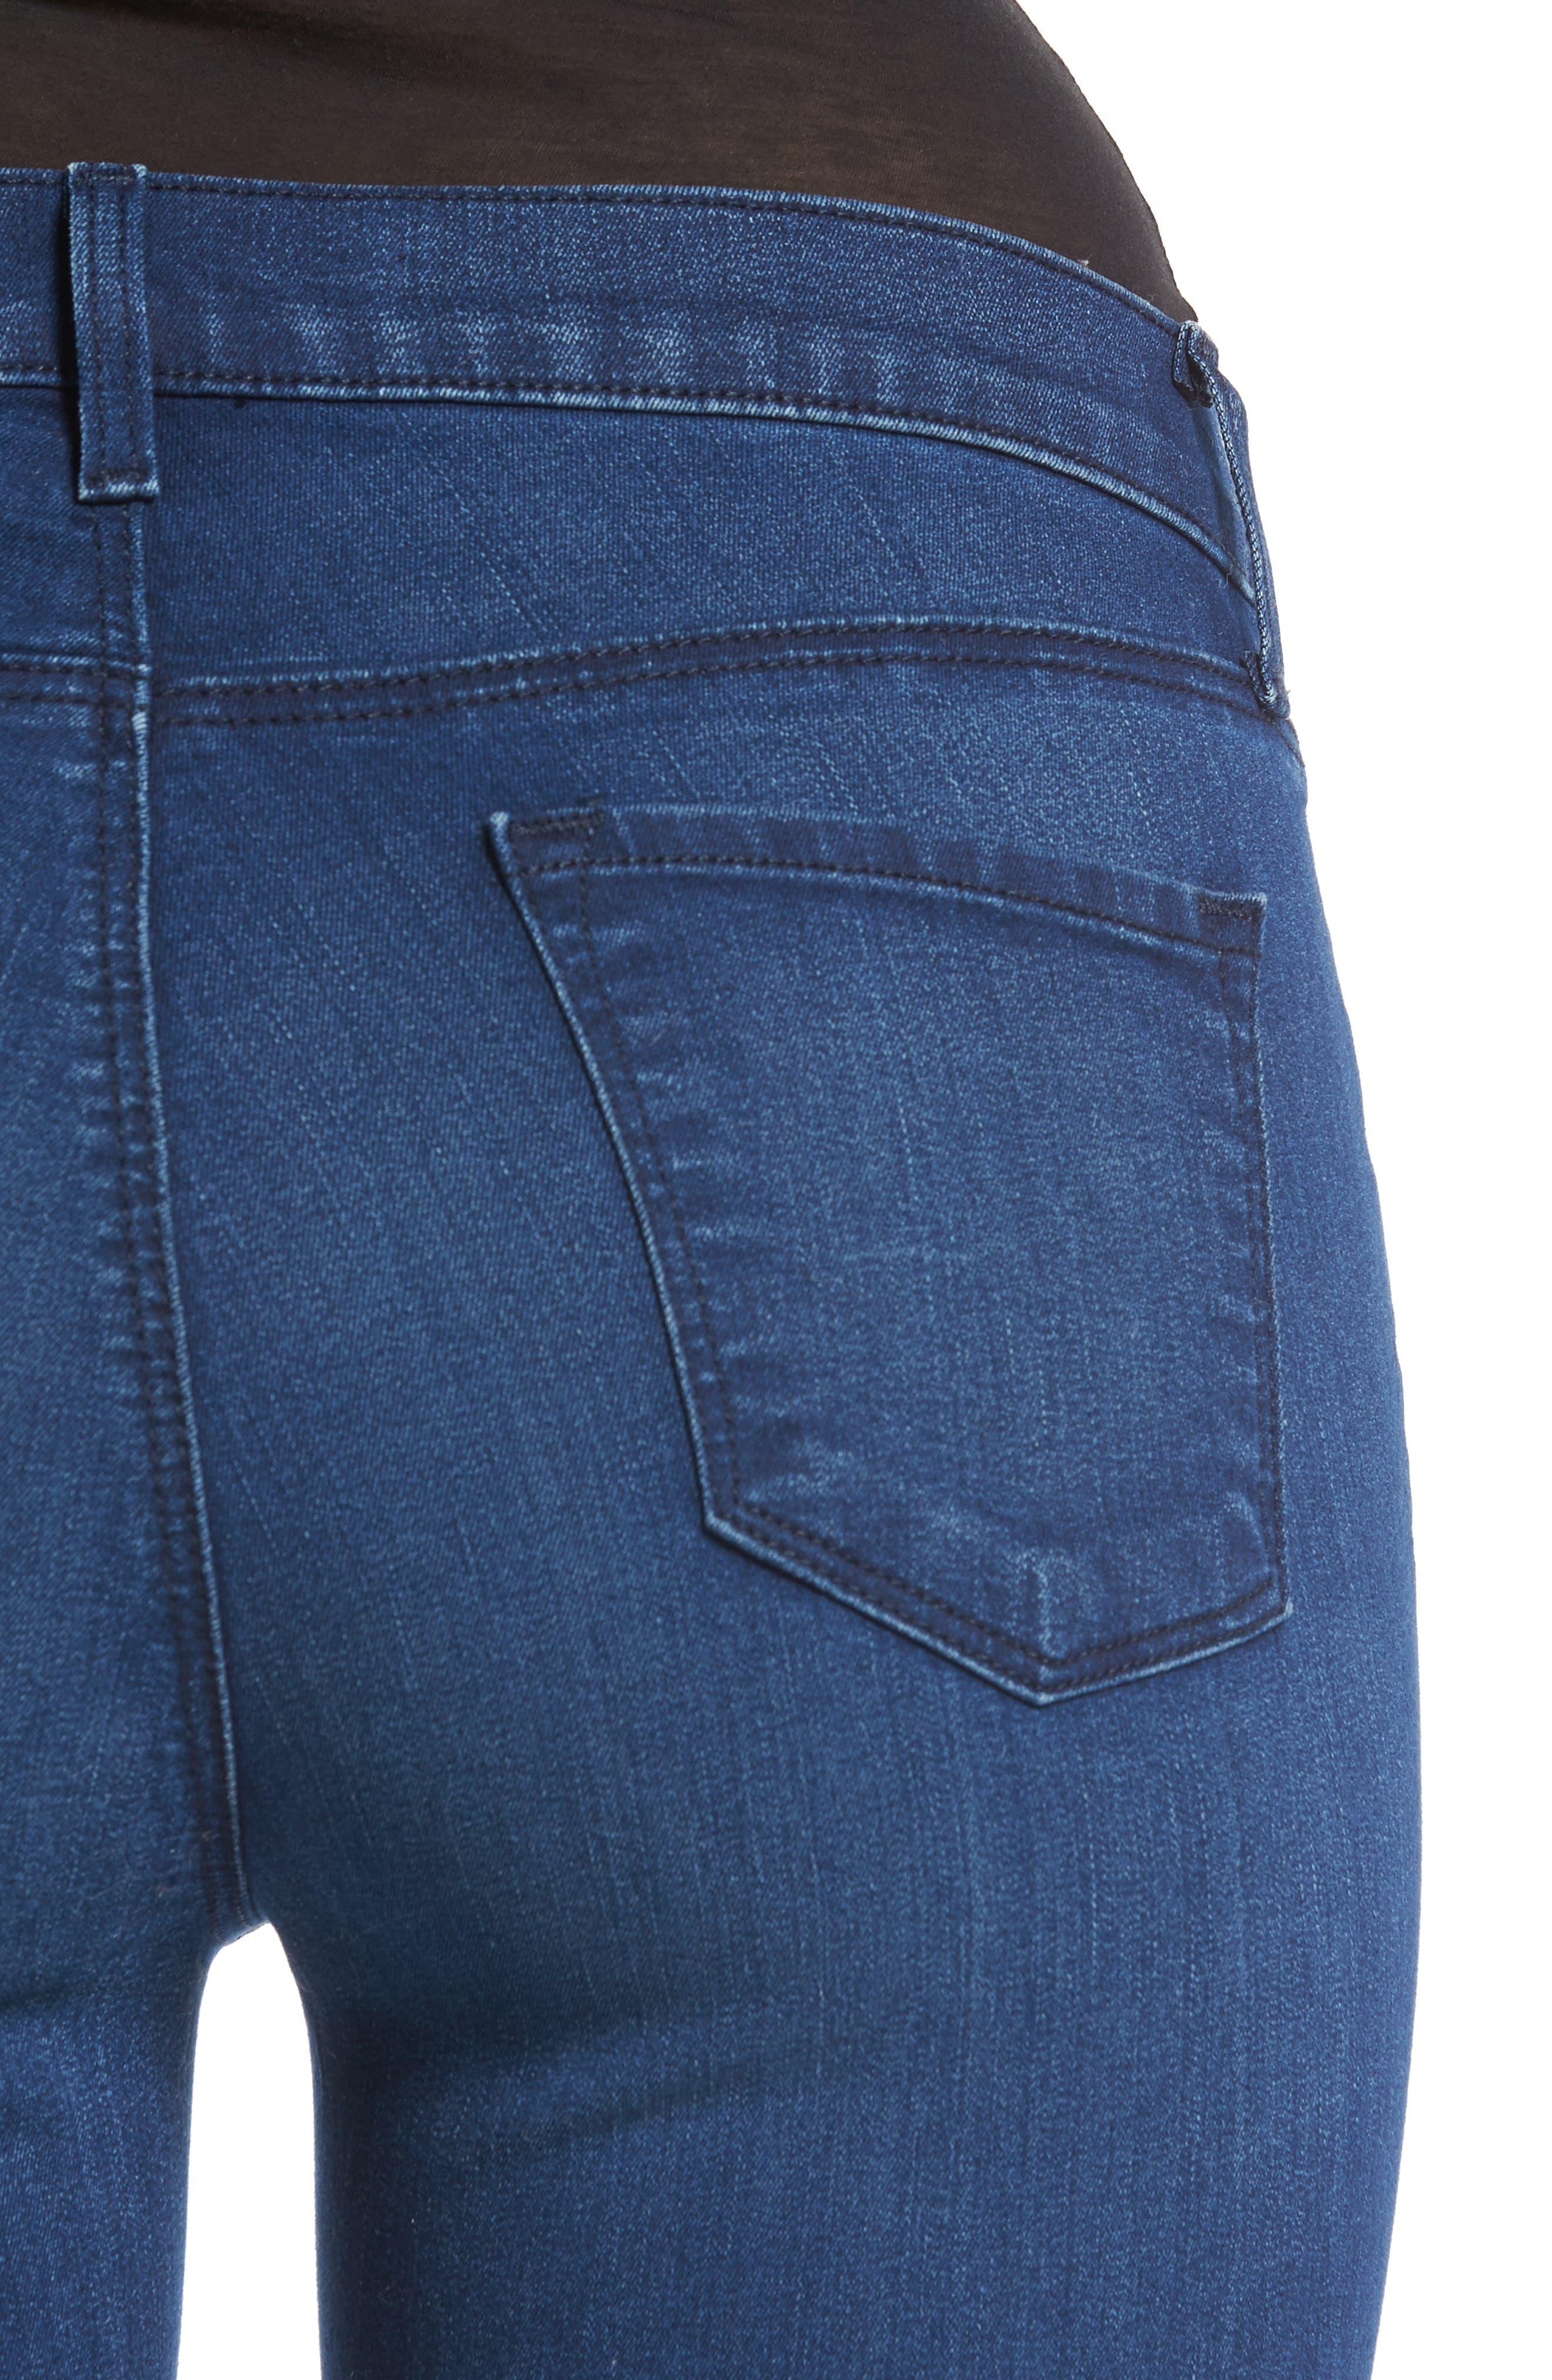 Alternate Image 4  - J Brand '811' Ankle Skinny Jeans (Sway)